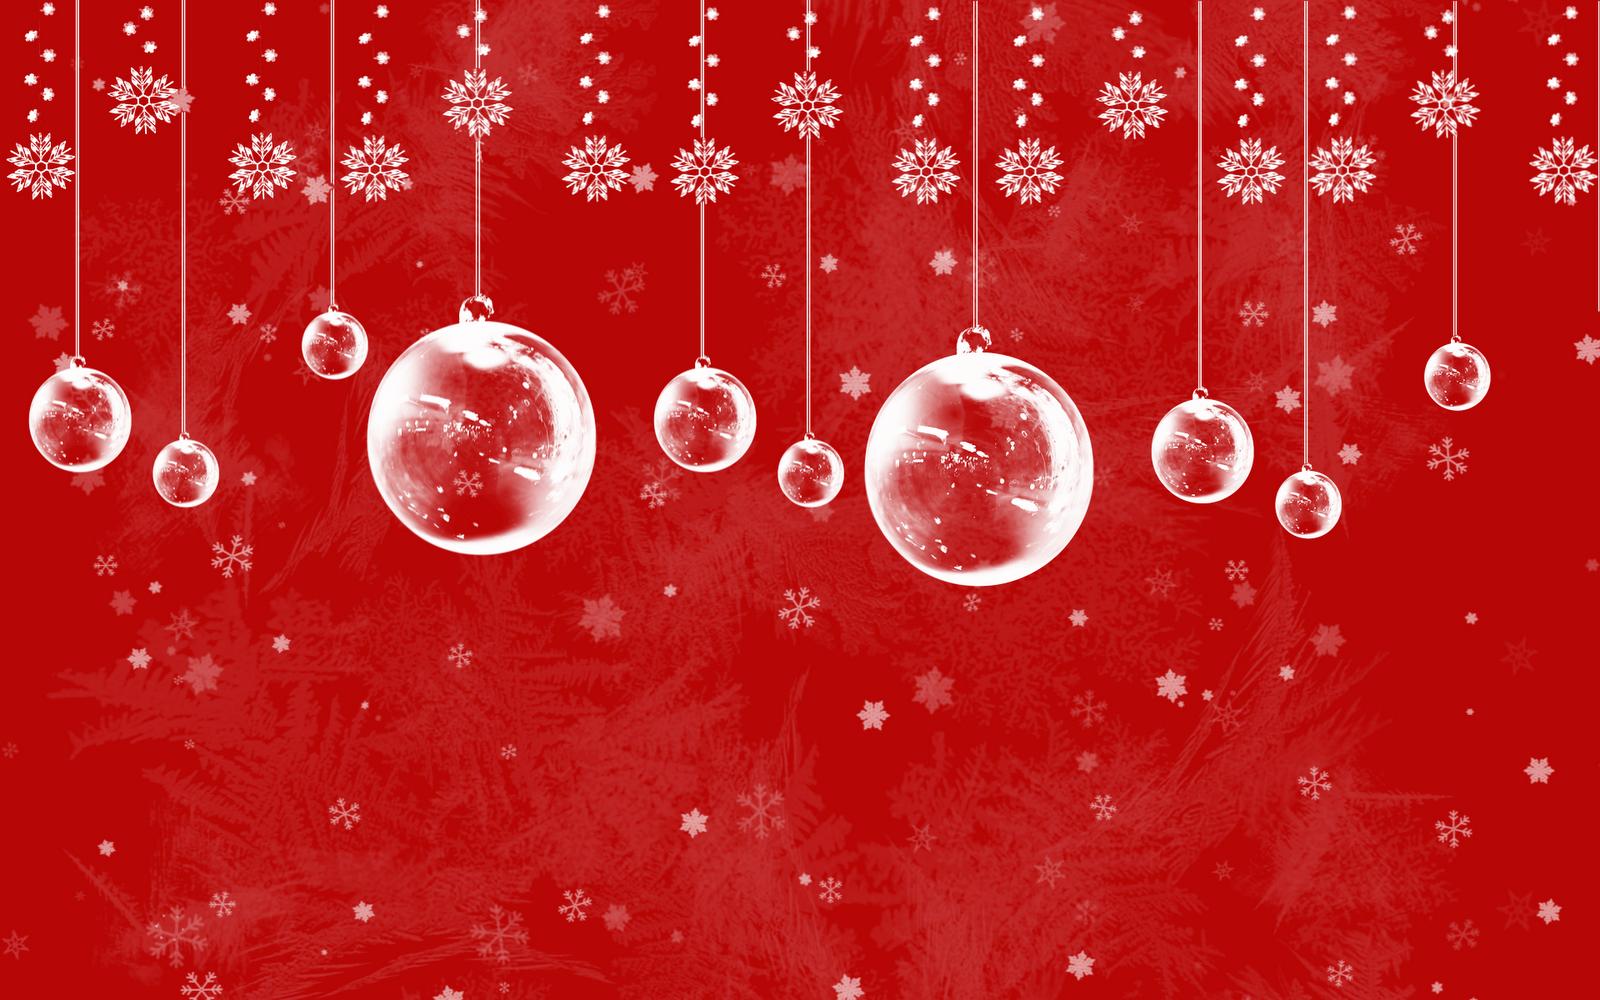 Christmas n New Year Wallpaper 2015